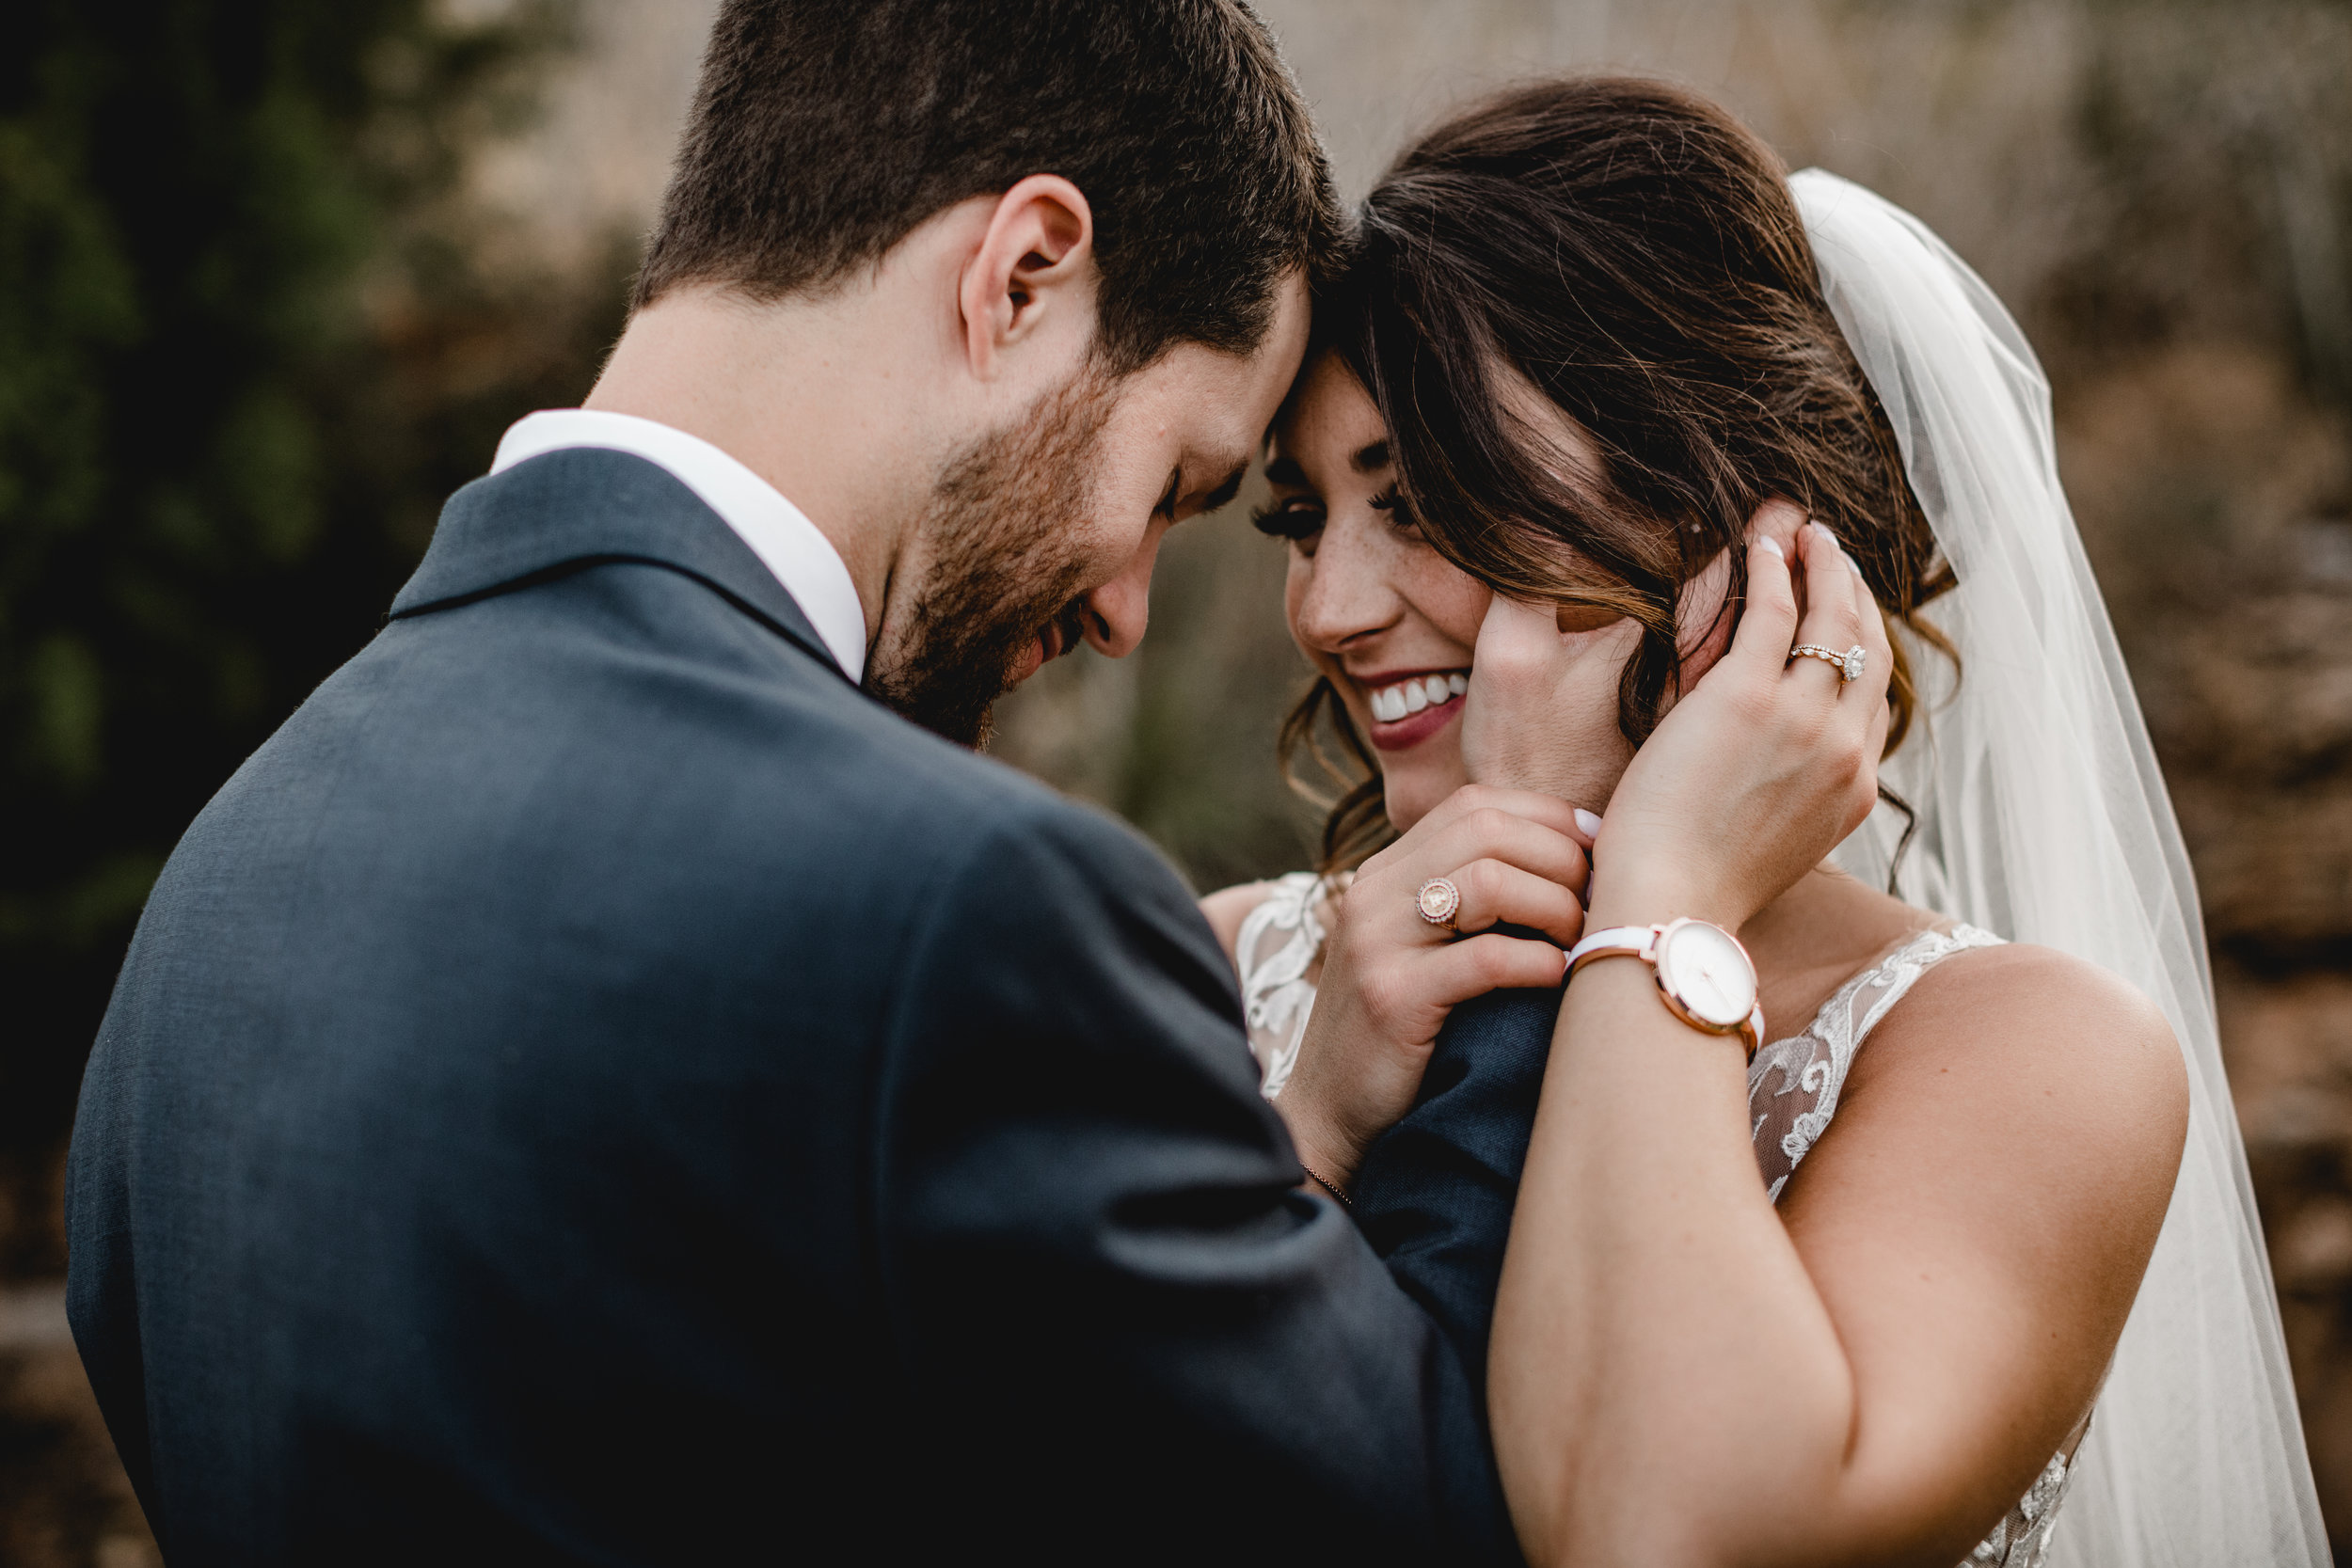 Newlyweds-108.jpg